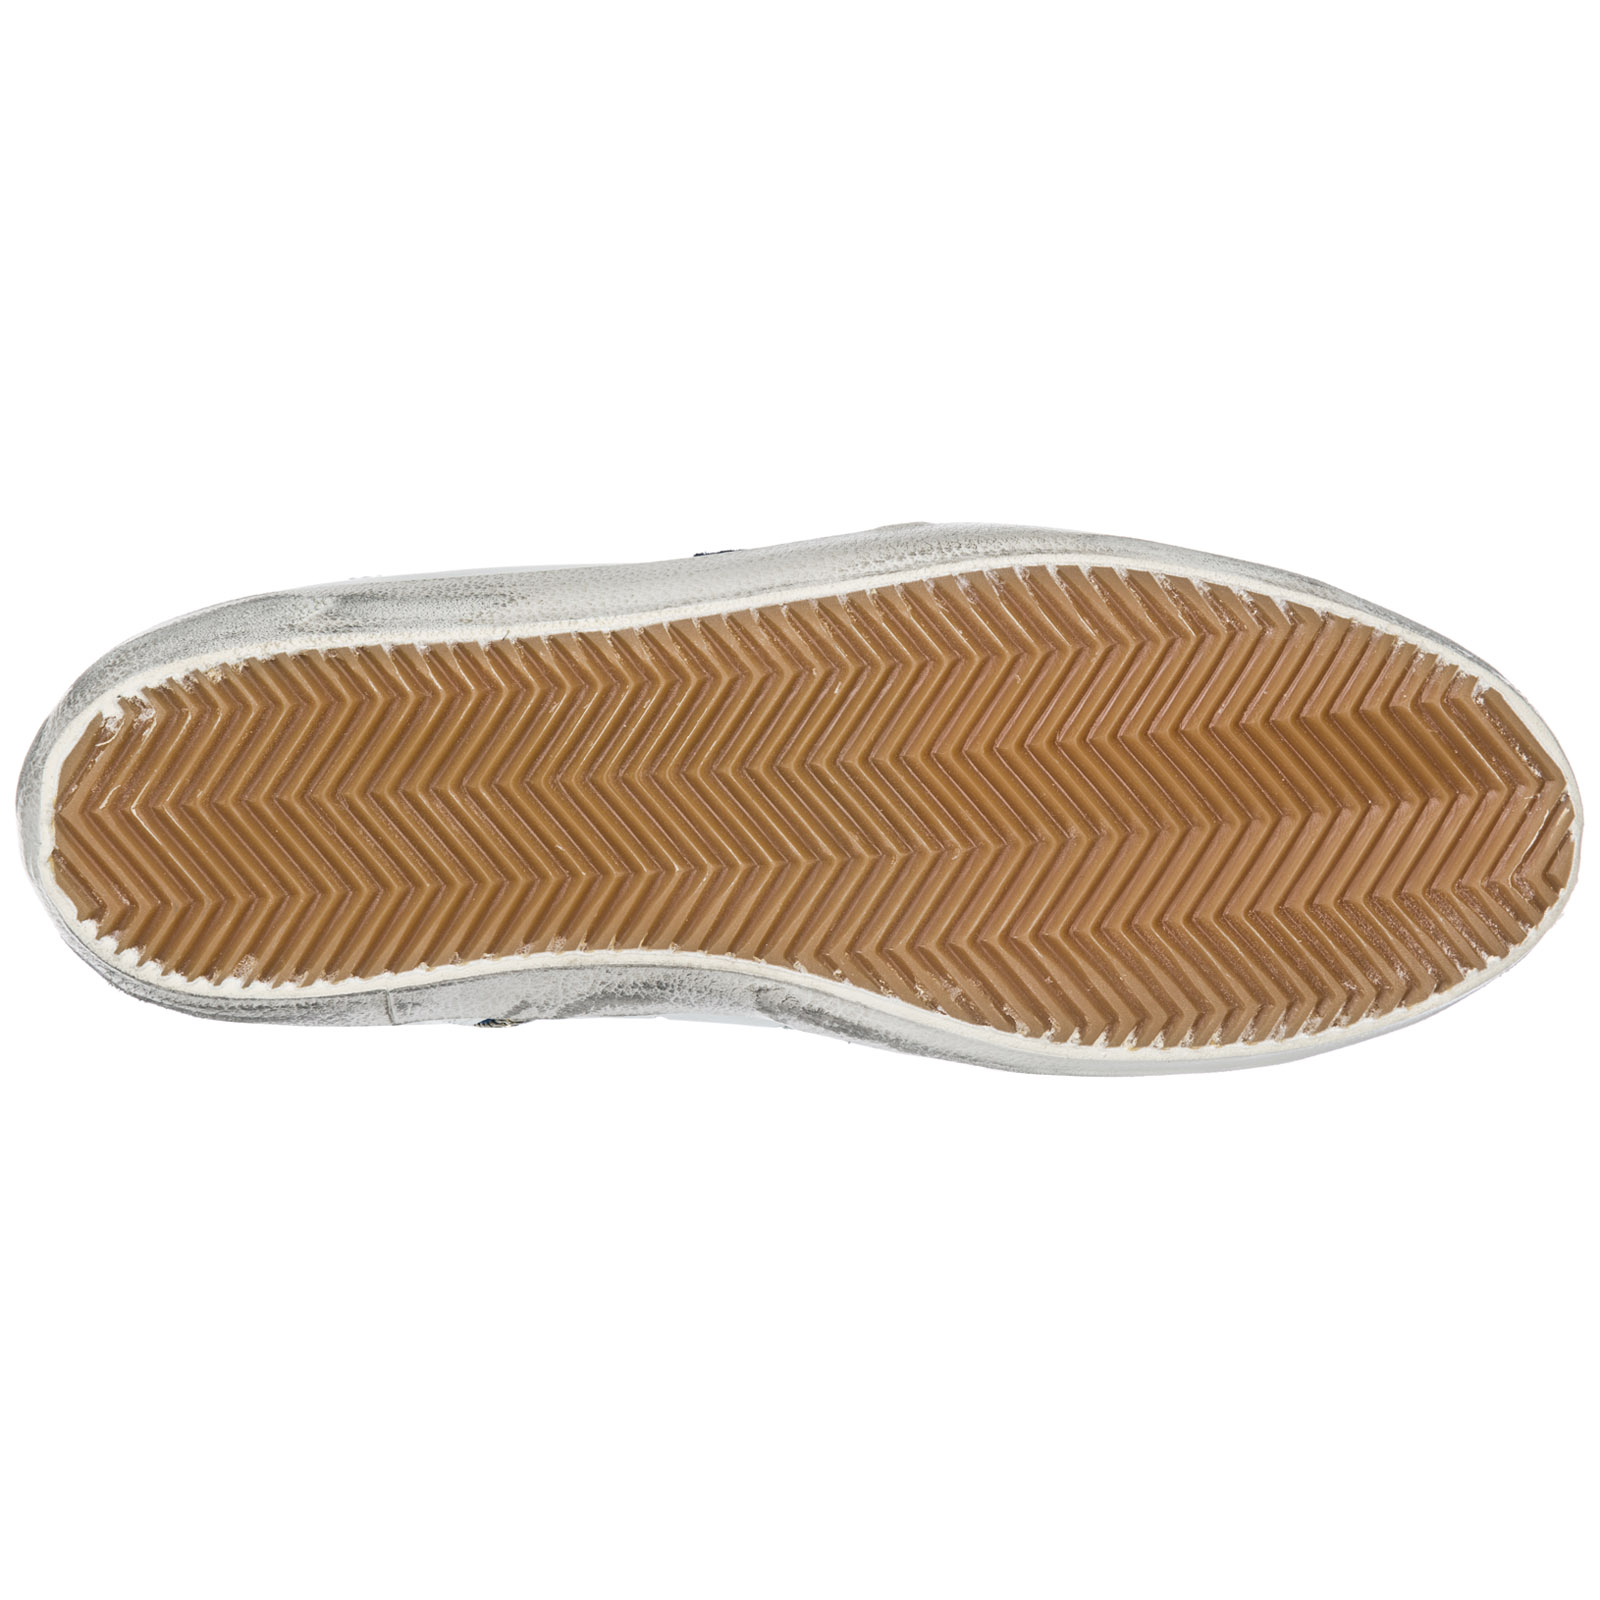 5e41d7a1b569 High top sneakers Golden Goose Francy G33MS591.B39 white - bluette ...